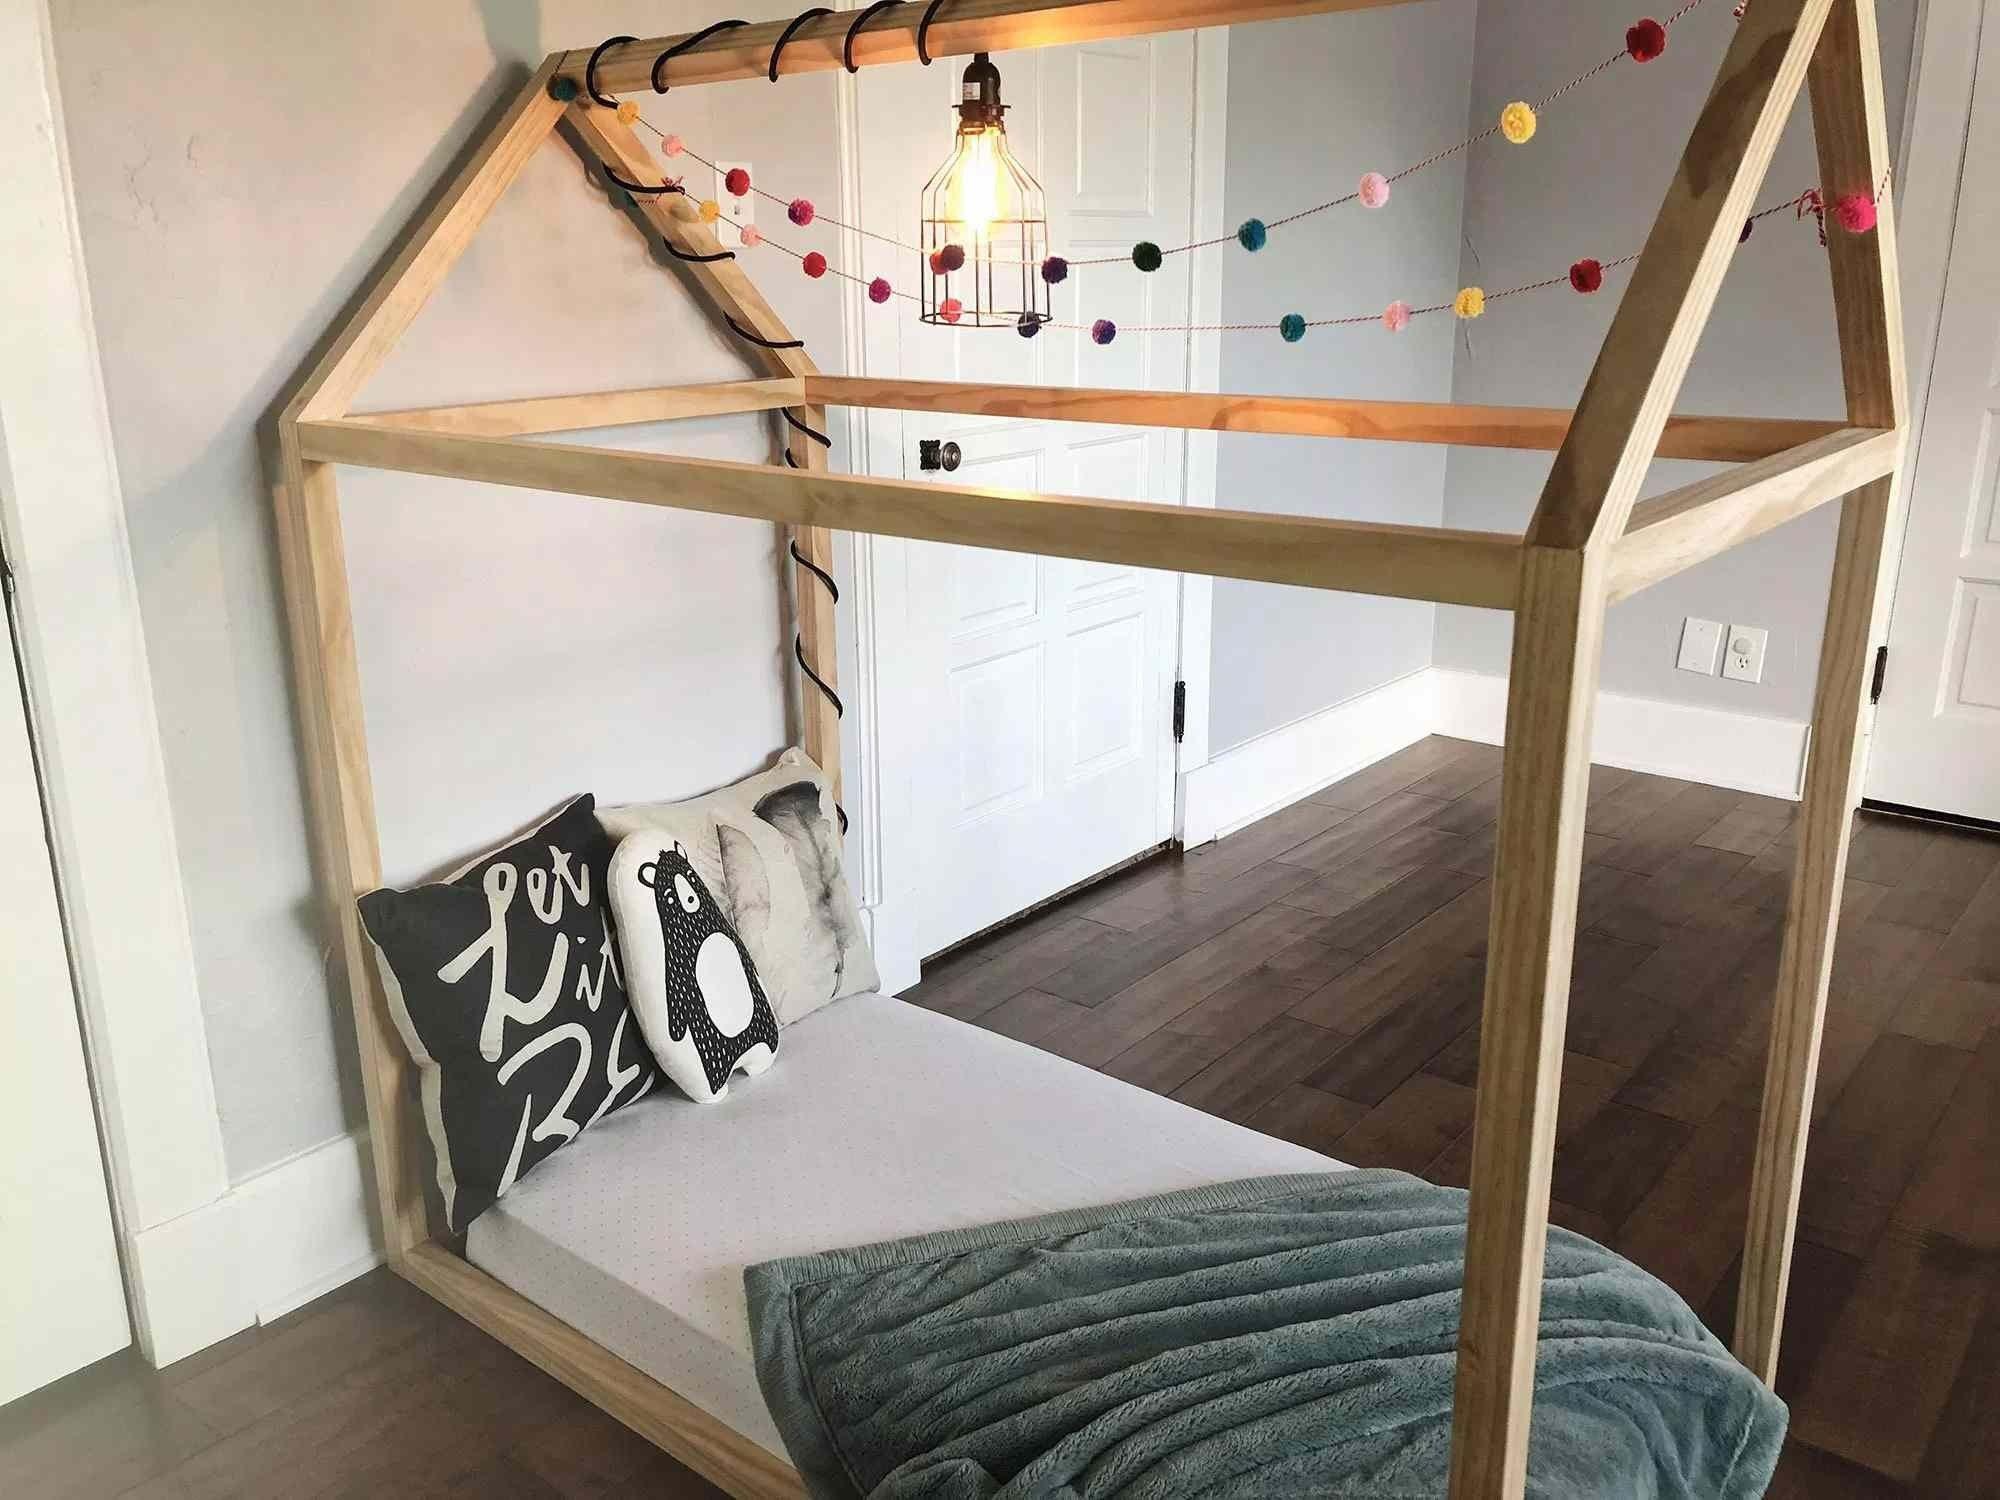 蚂蚁彩票 蚂蚁彩票官网 蚂蚁彩票app 蚂蚁彩票下载 House Beds For Kids Toddler House Bed Toddler Bed Frame